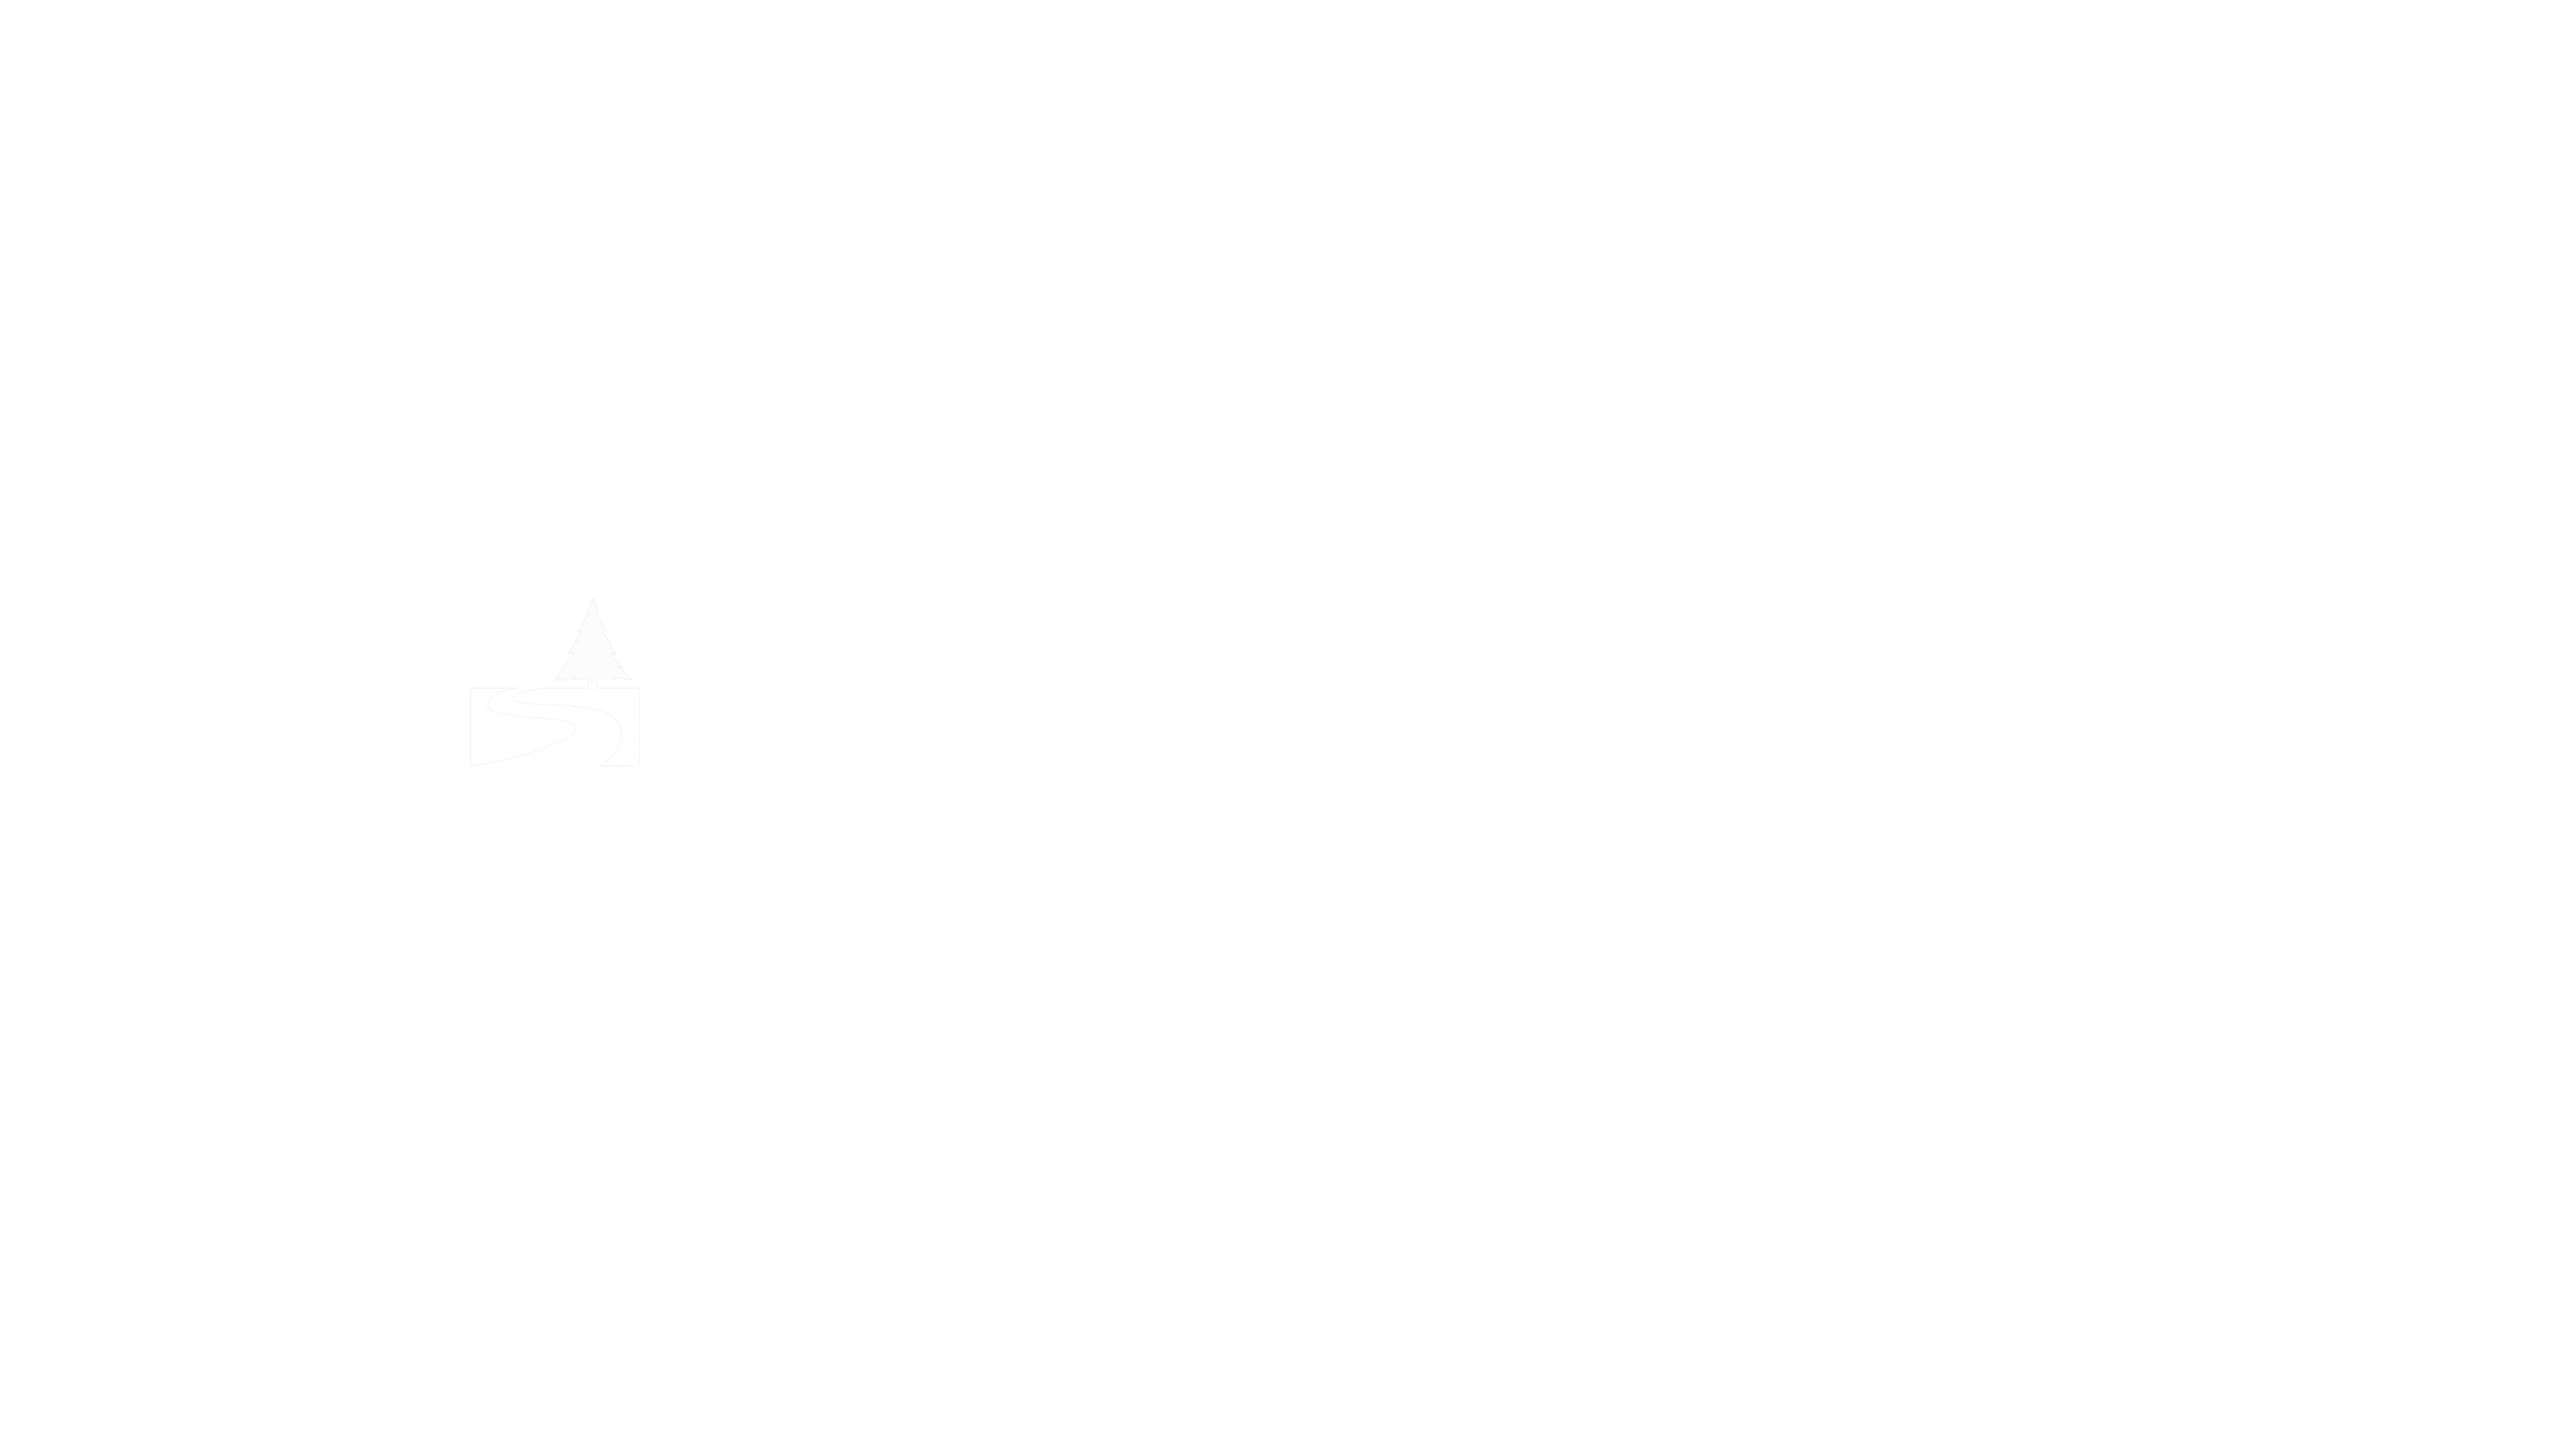 PRODUKTIONWALDSTRASSE